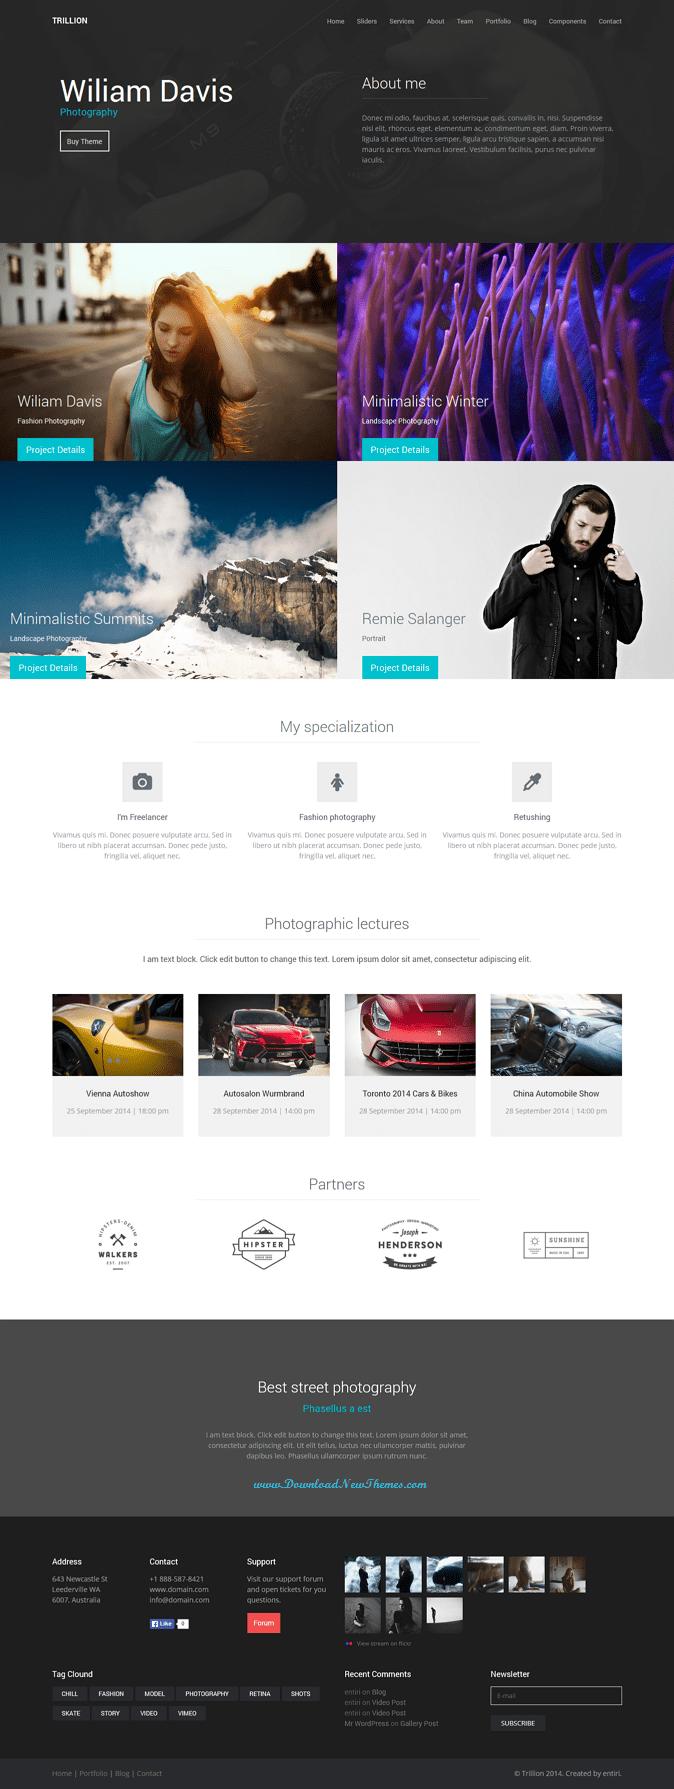 TRILLION is responsive multipurpose WordPress theme suitable for restaurants, car dealers, portf ...